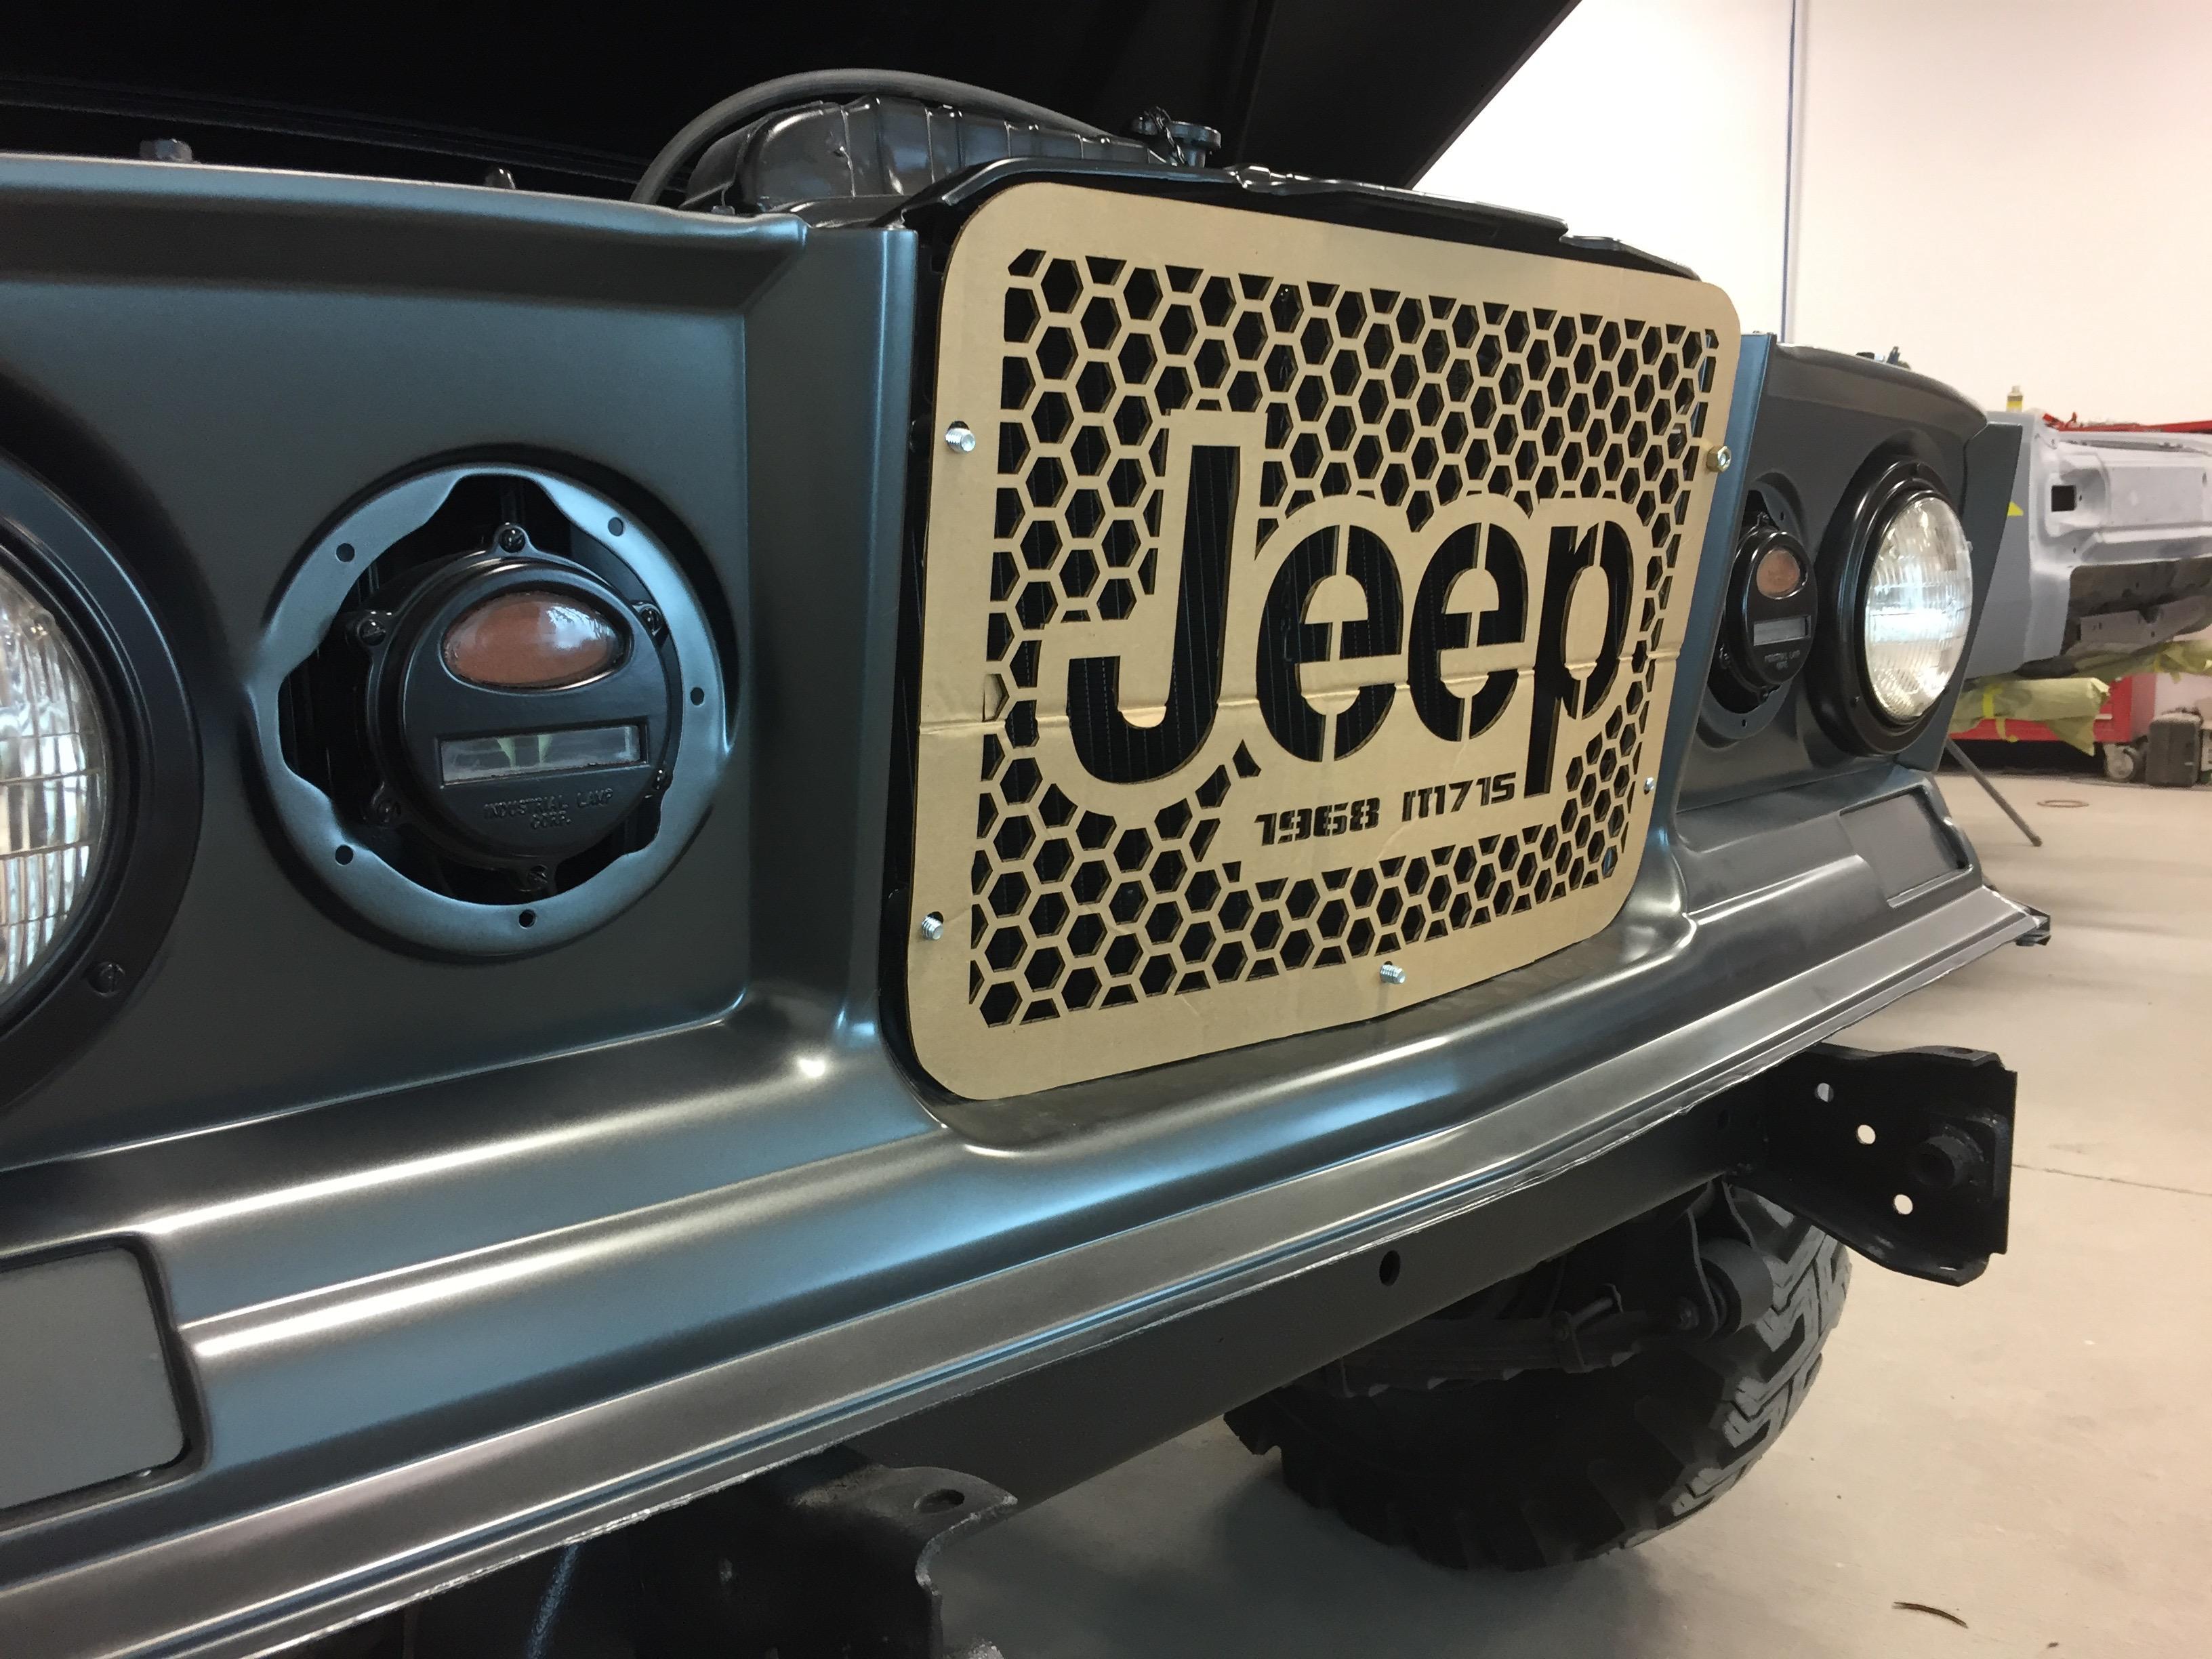 1968 Jeep M715